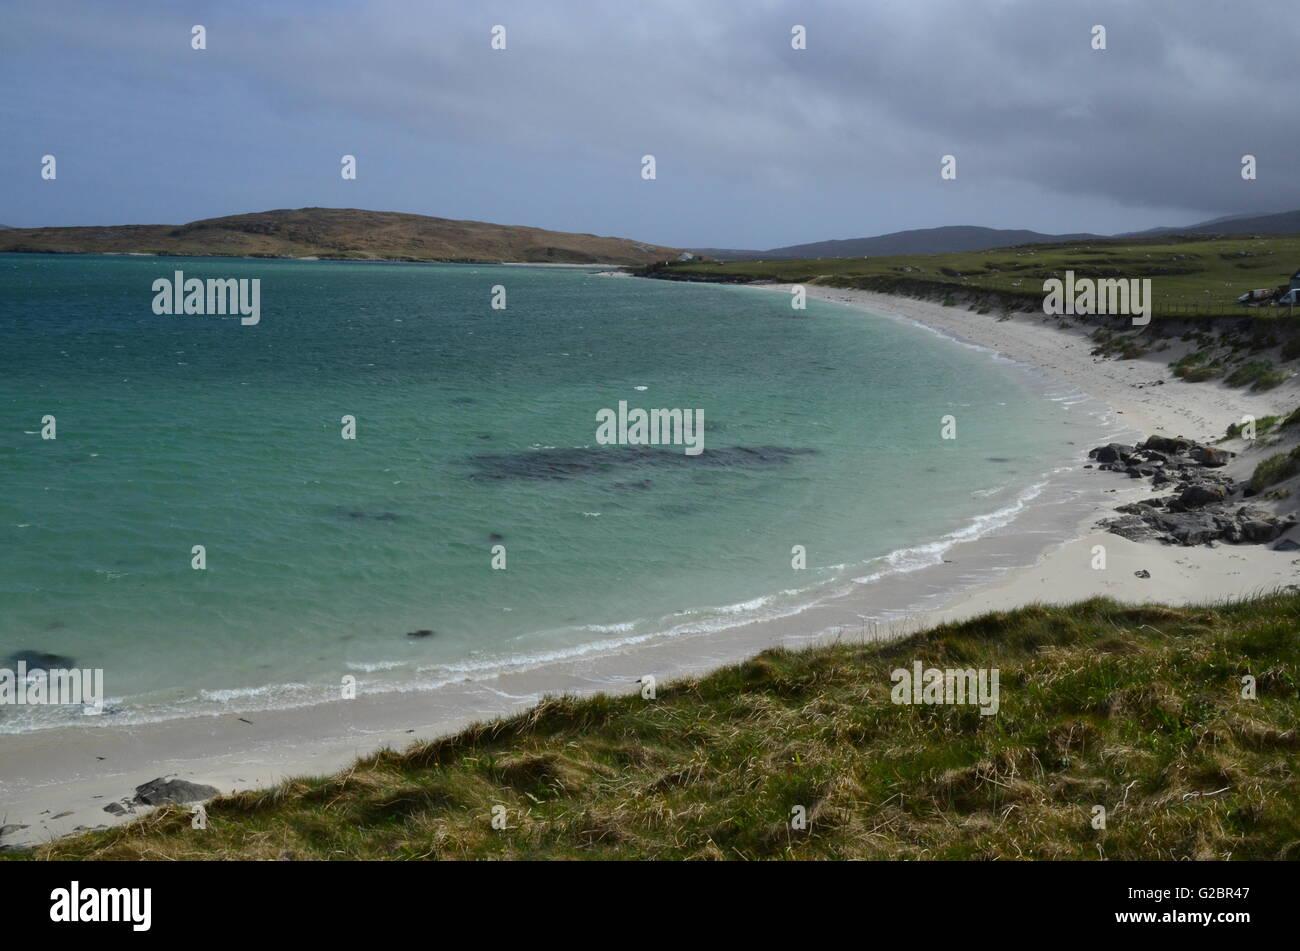 Isle of Barra, Outer Hebrides, Scotland - Stock Image